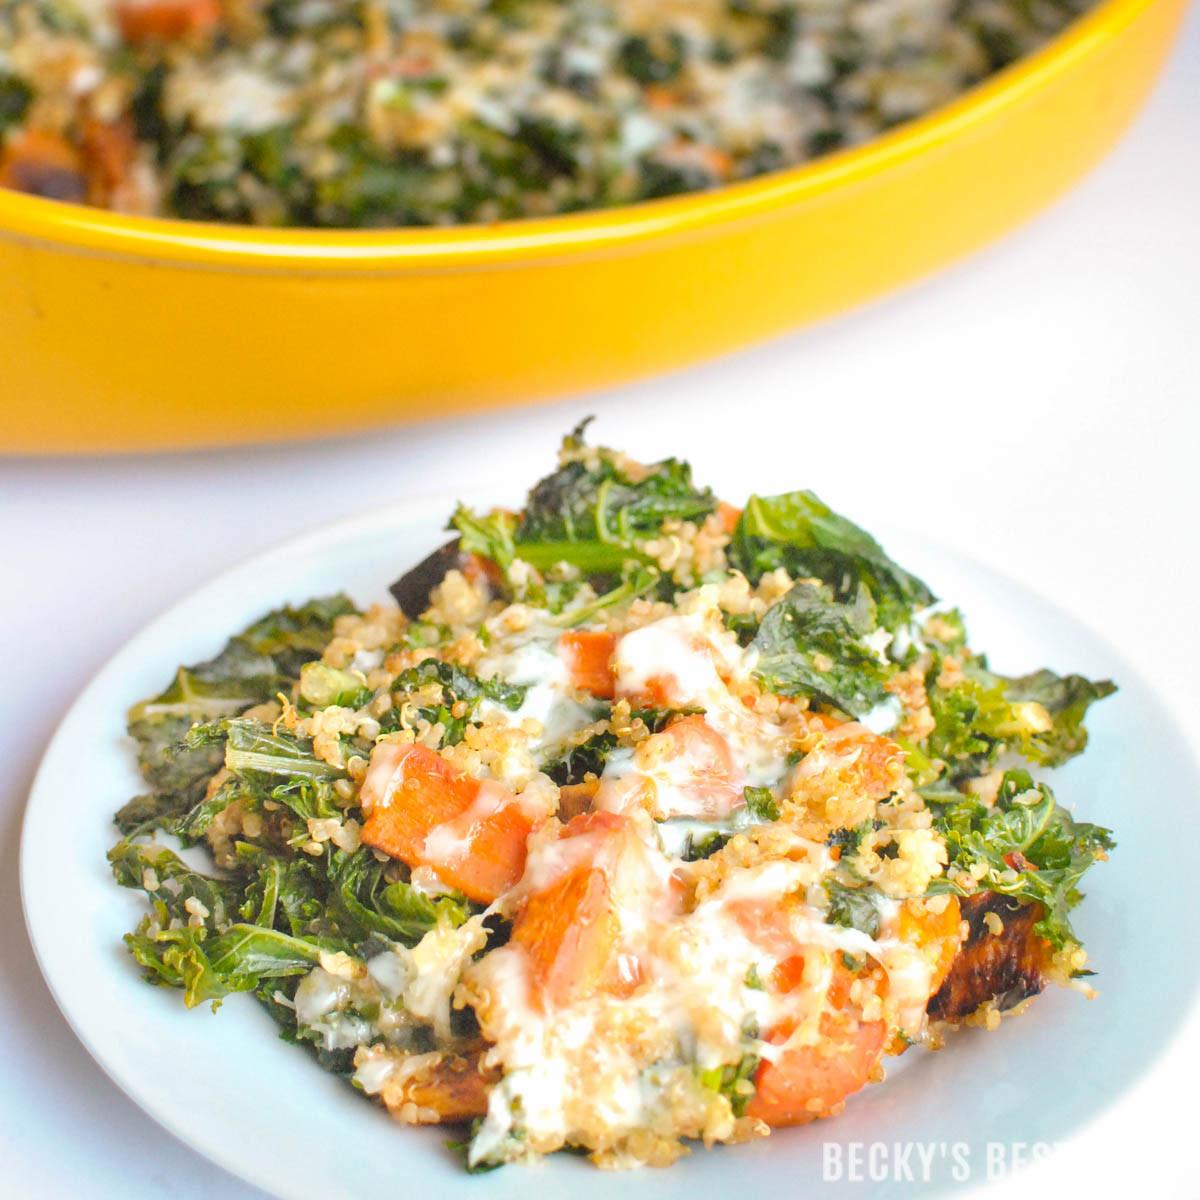 Vegetarian Casserole Recipes Healthy  Kale & Roasted Ve able Quinoa Casserole